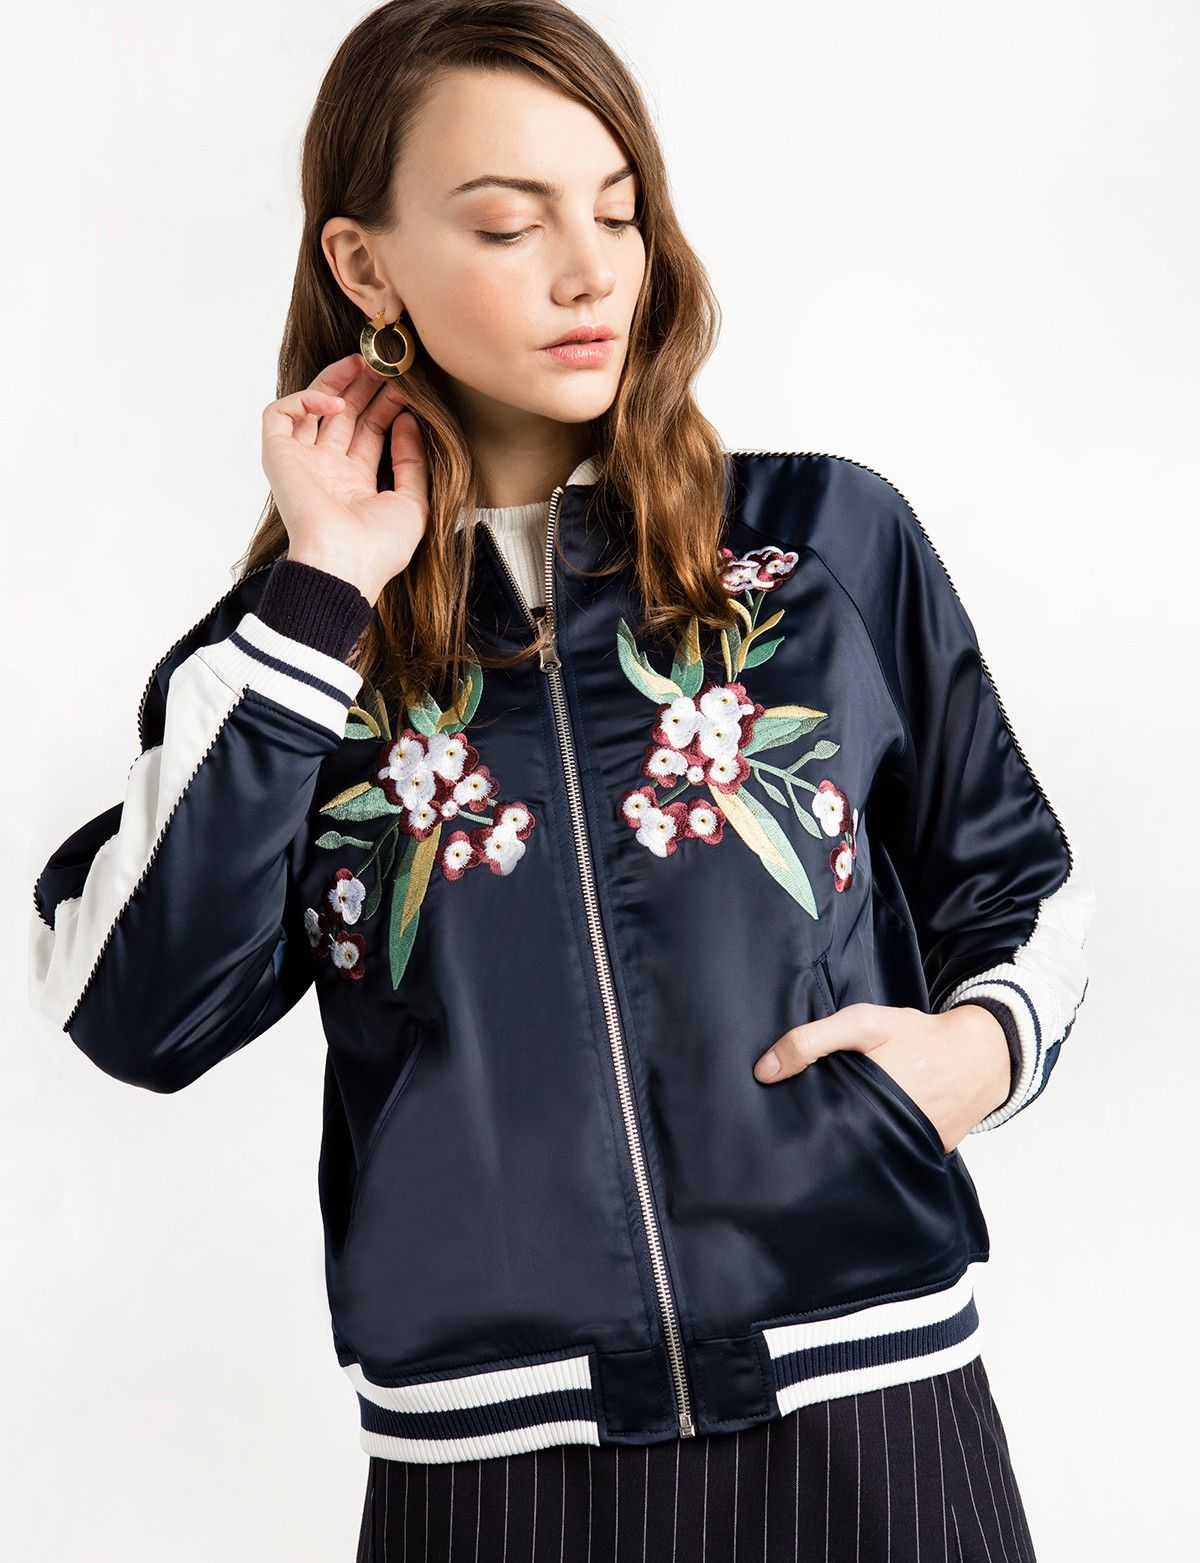 Navy Reversible Floral Bomber Jacket Fashion Winter Fashion Looks Floral Bomber Jacket [ 1563 x 1200 Pixel ]